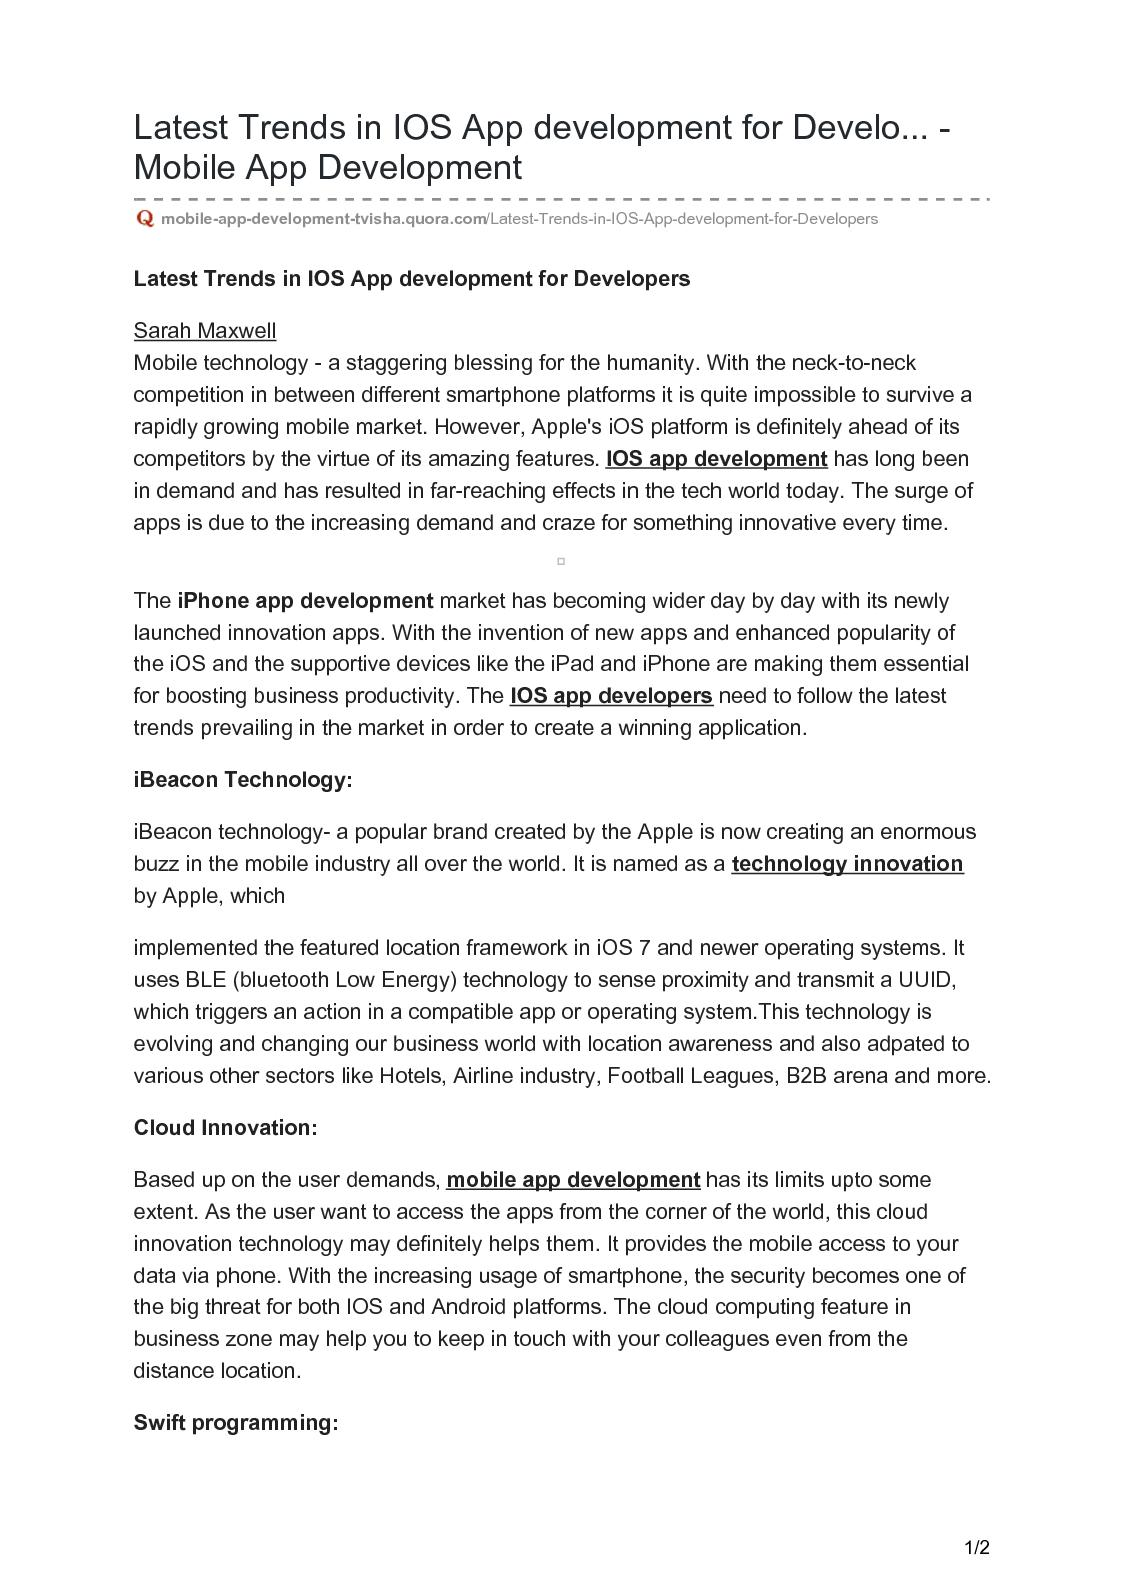 Calaméo - Mobile App Development Tvisha Quora Com Latest Trends In